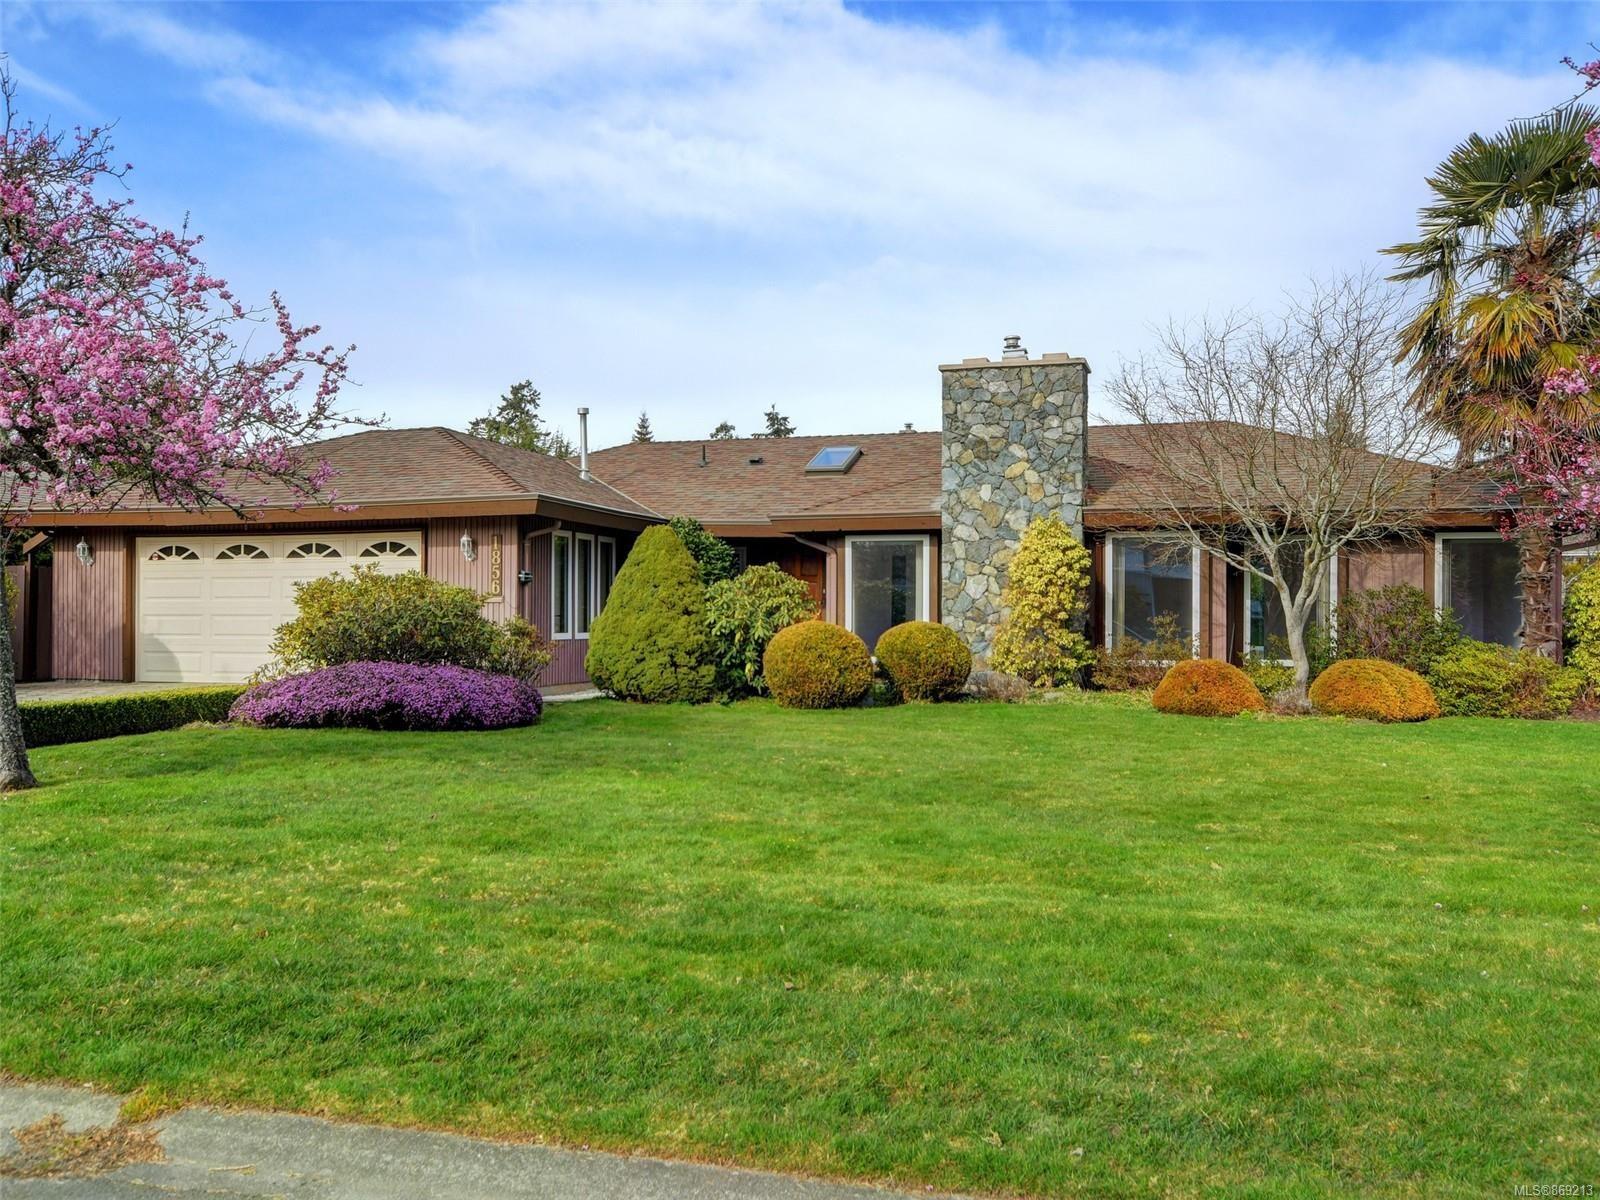 Main Photo: 1856 Hillcrest Ave in Saanich: SE Gordon Head House for sale (Saanich East)  : MLS®# 869213